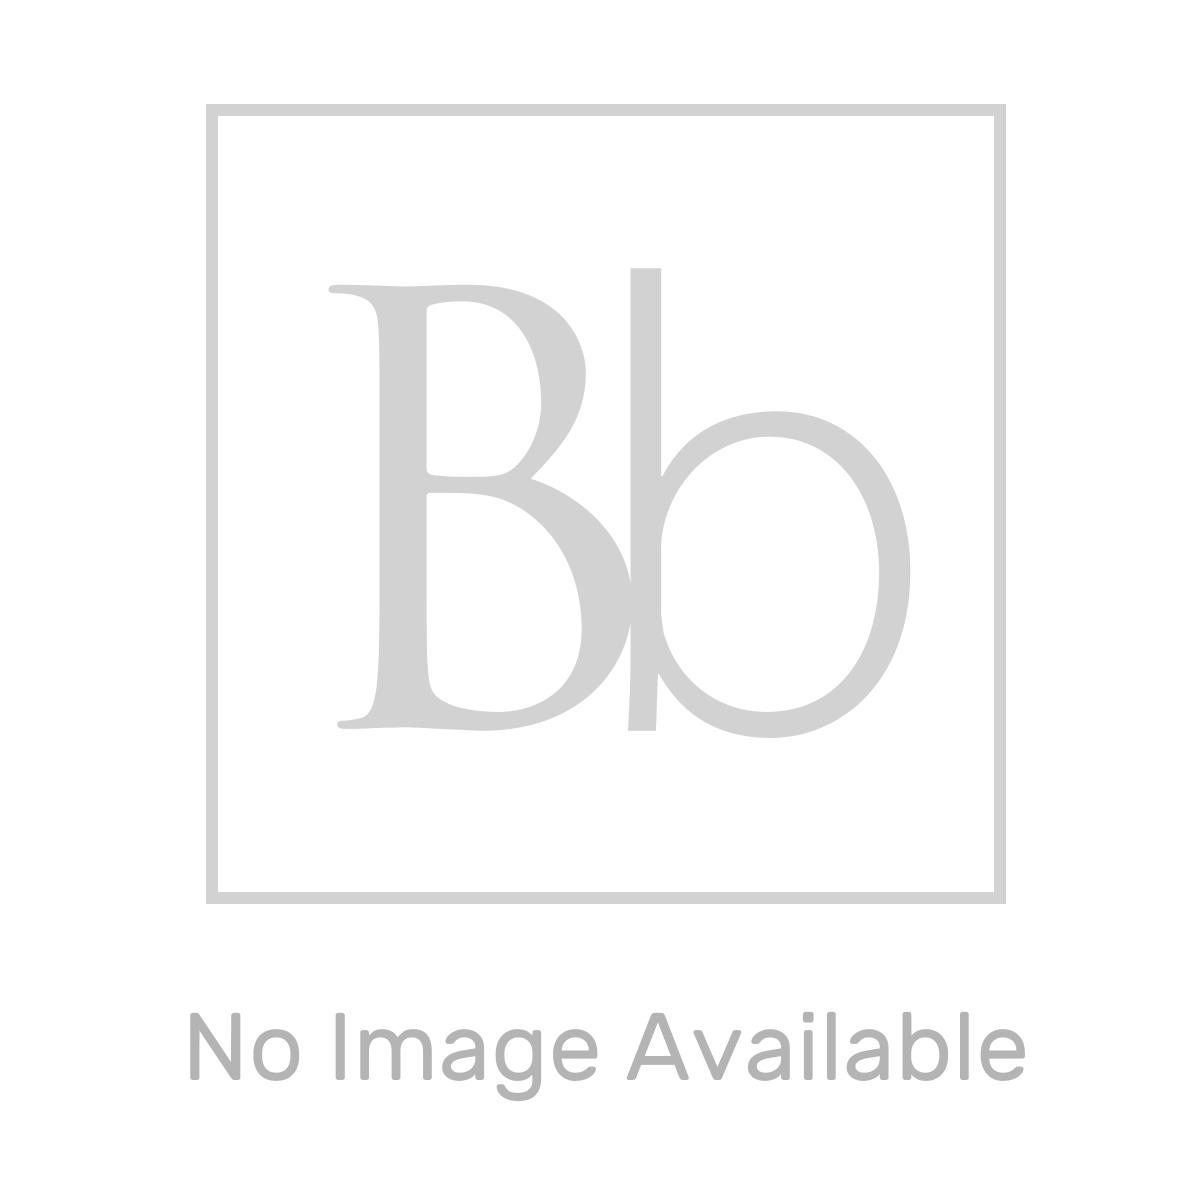 RAK Prima Tech Chrome Tall Mono Basin Mixer Tap Measurements